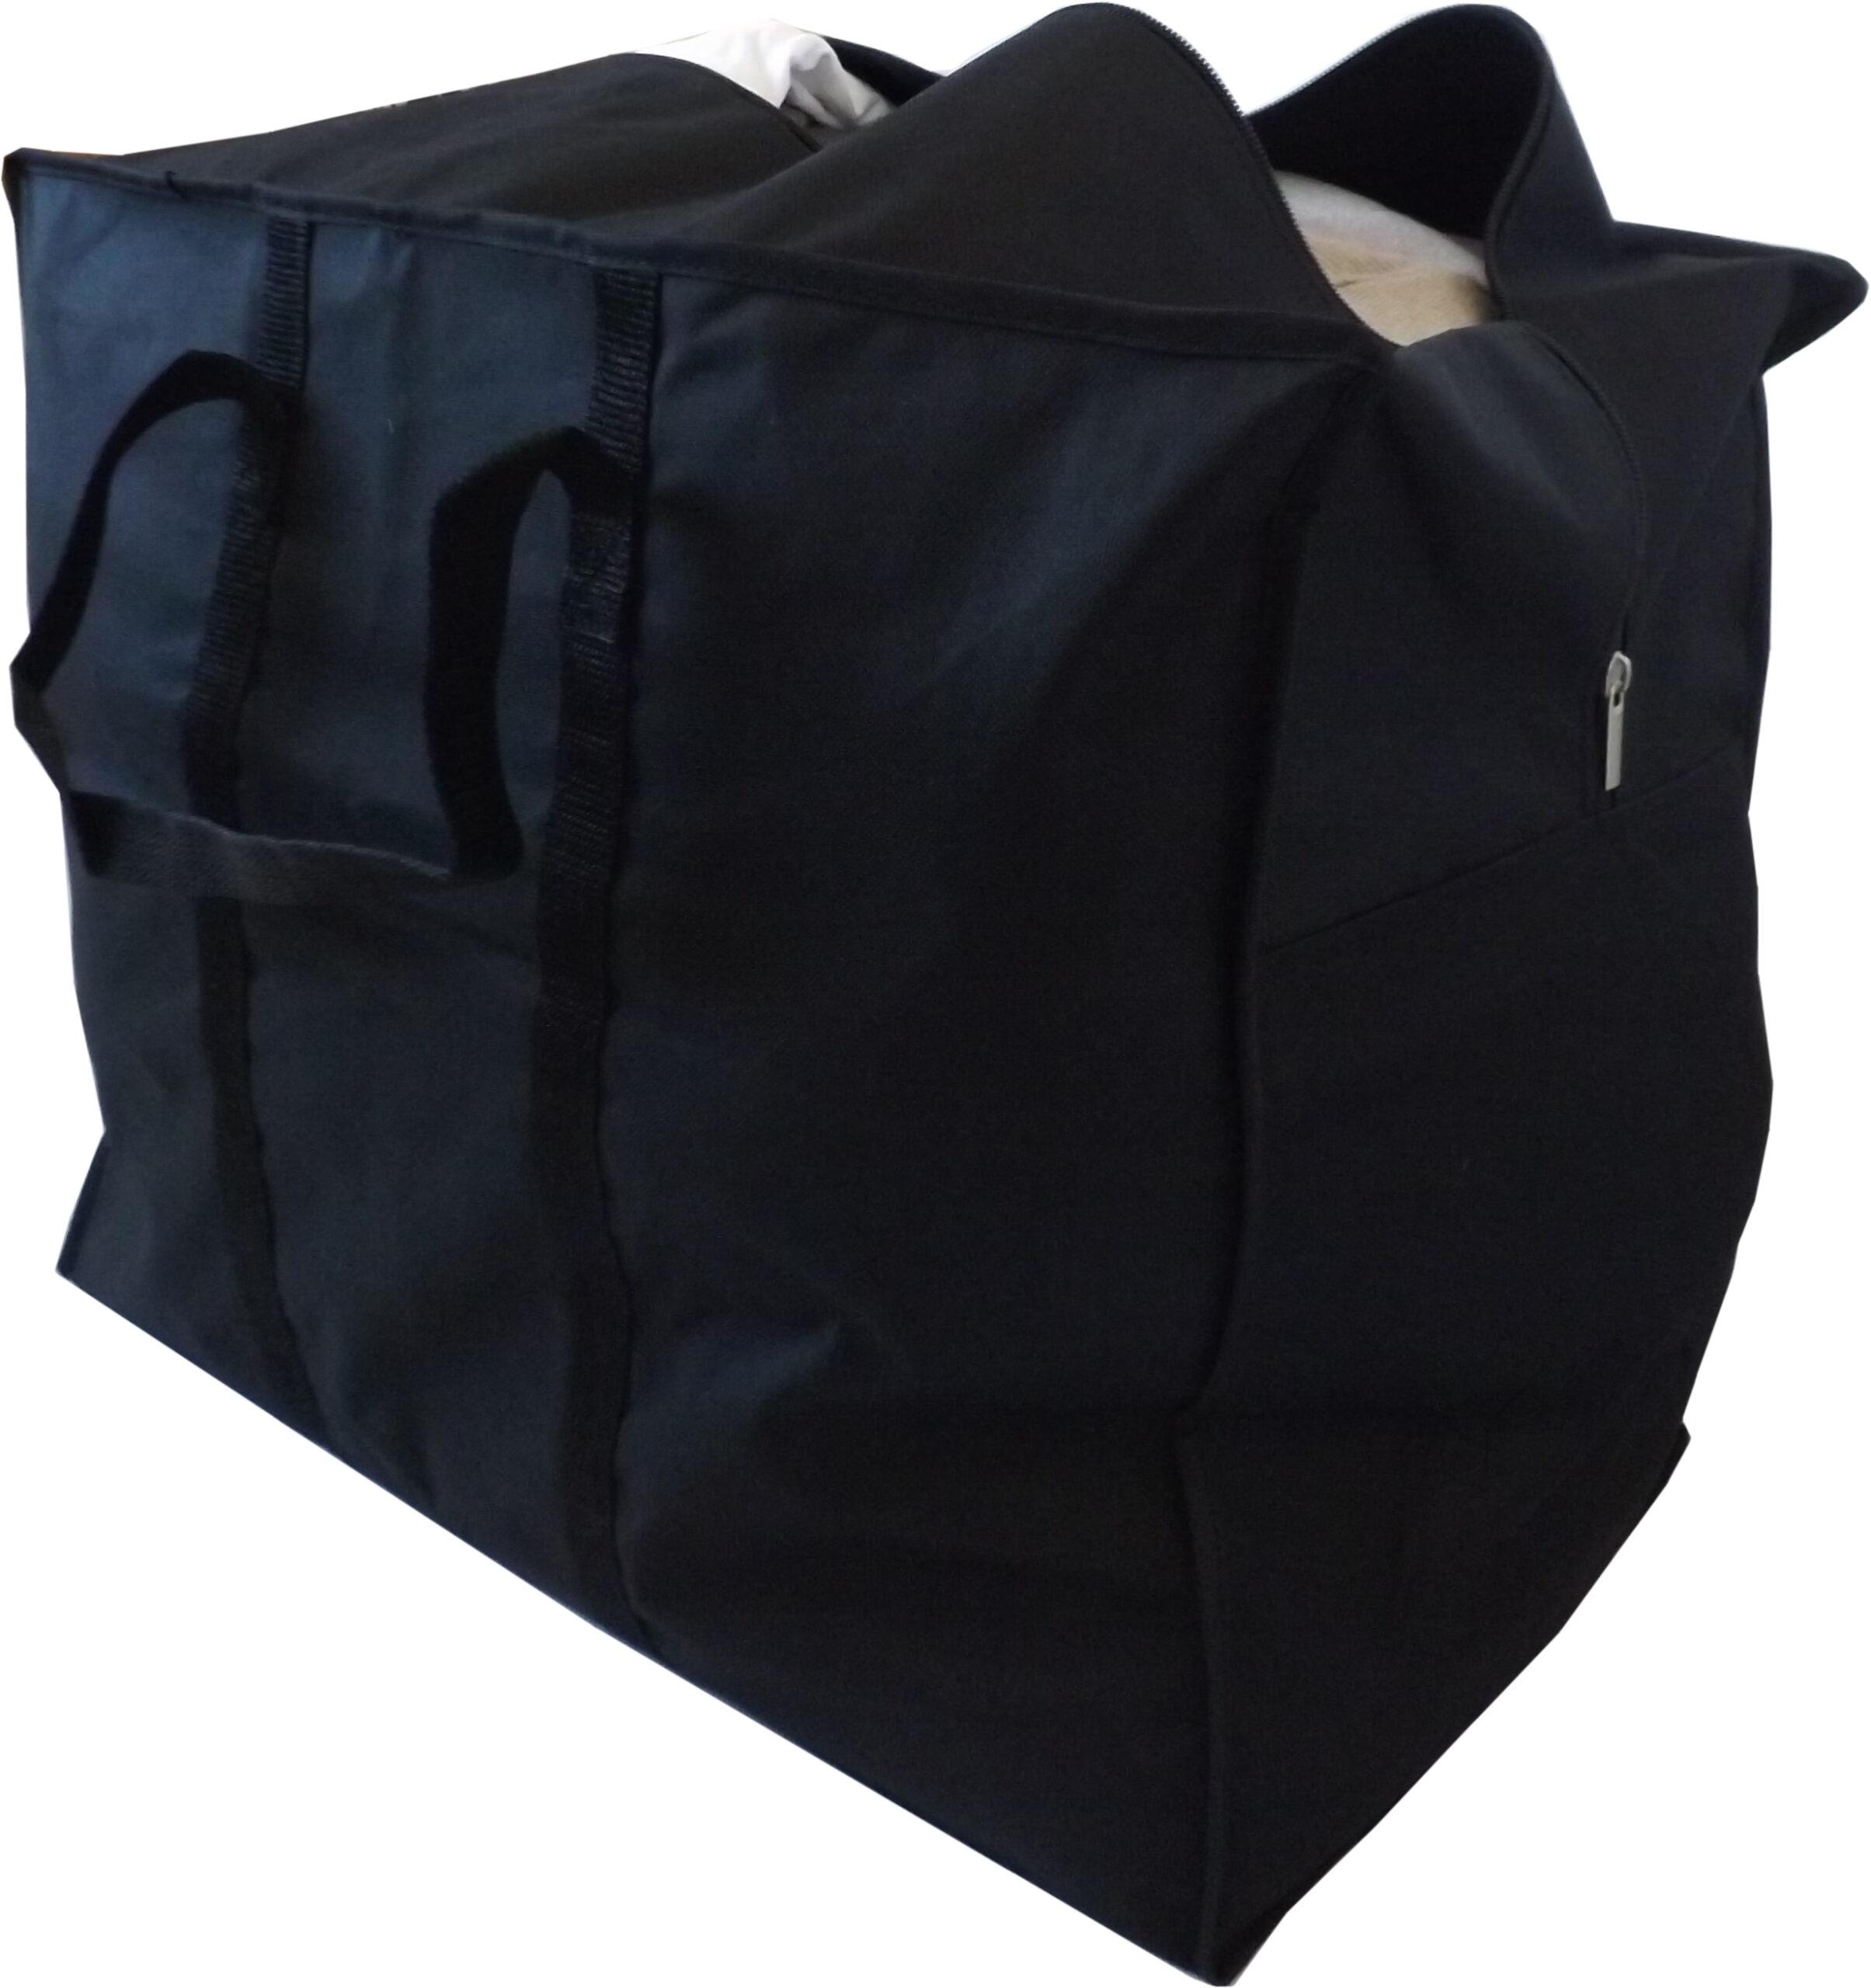 Medium Clothes Storage or Travel Bag, Heavy Duty, 70 Litre Capacity,  55x45x30cm, Black